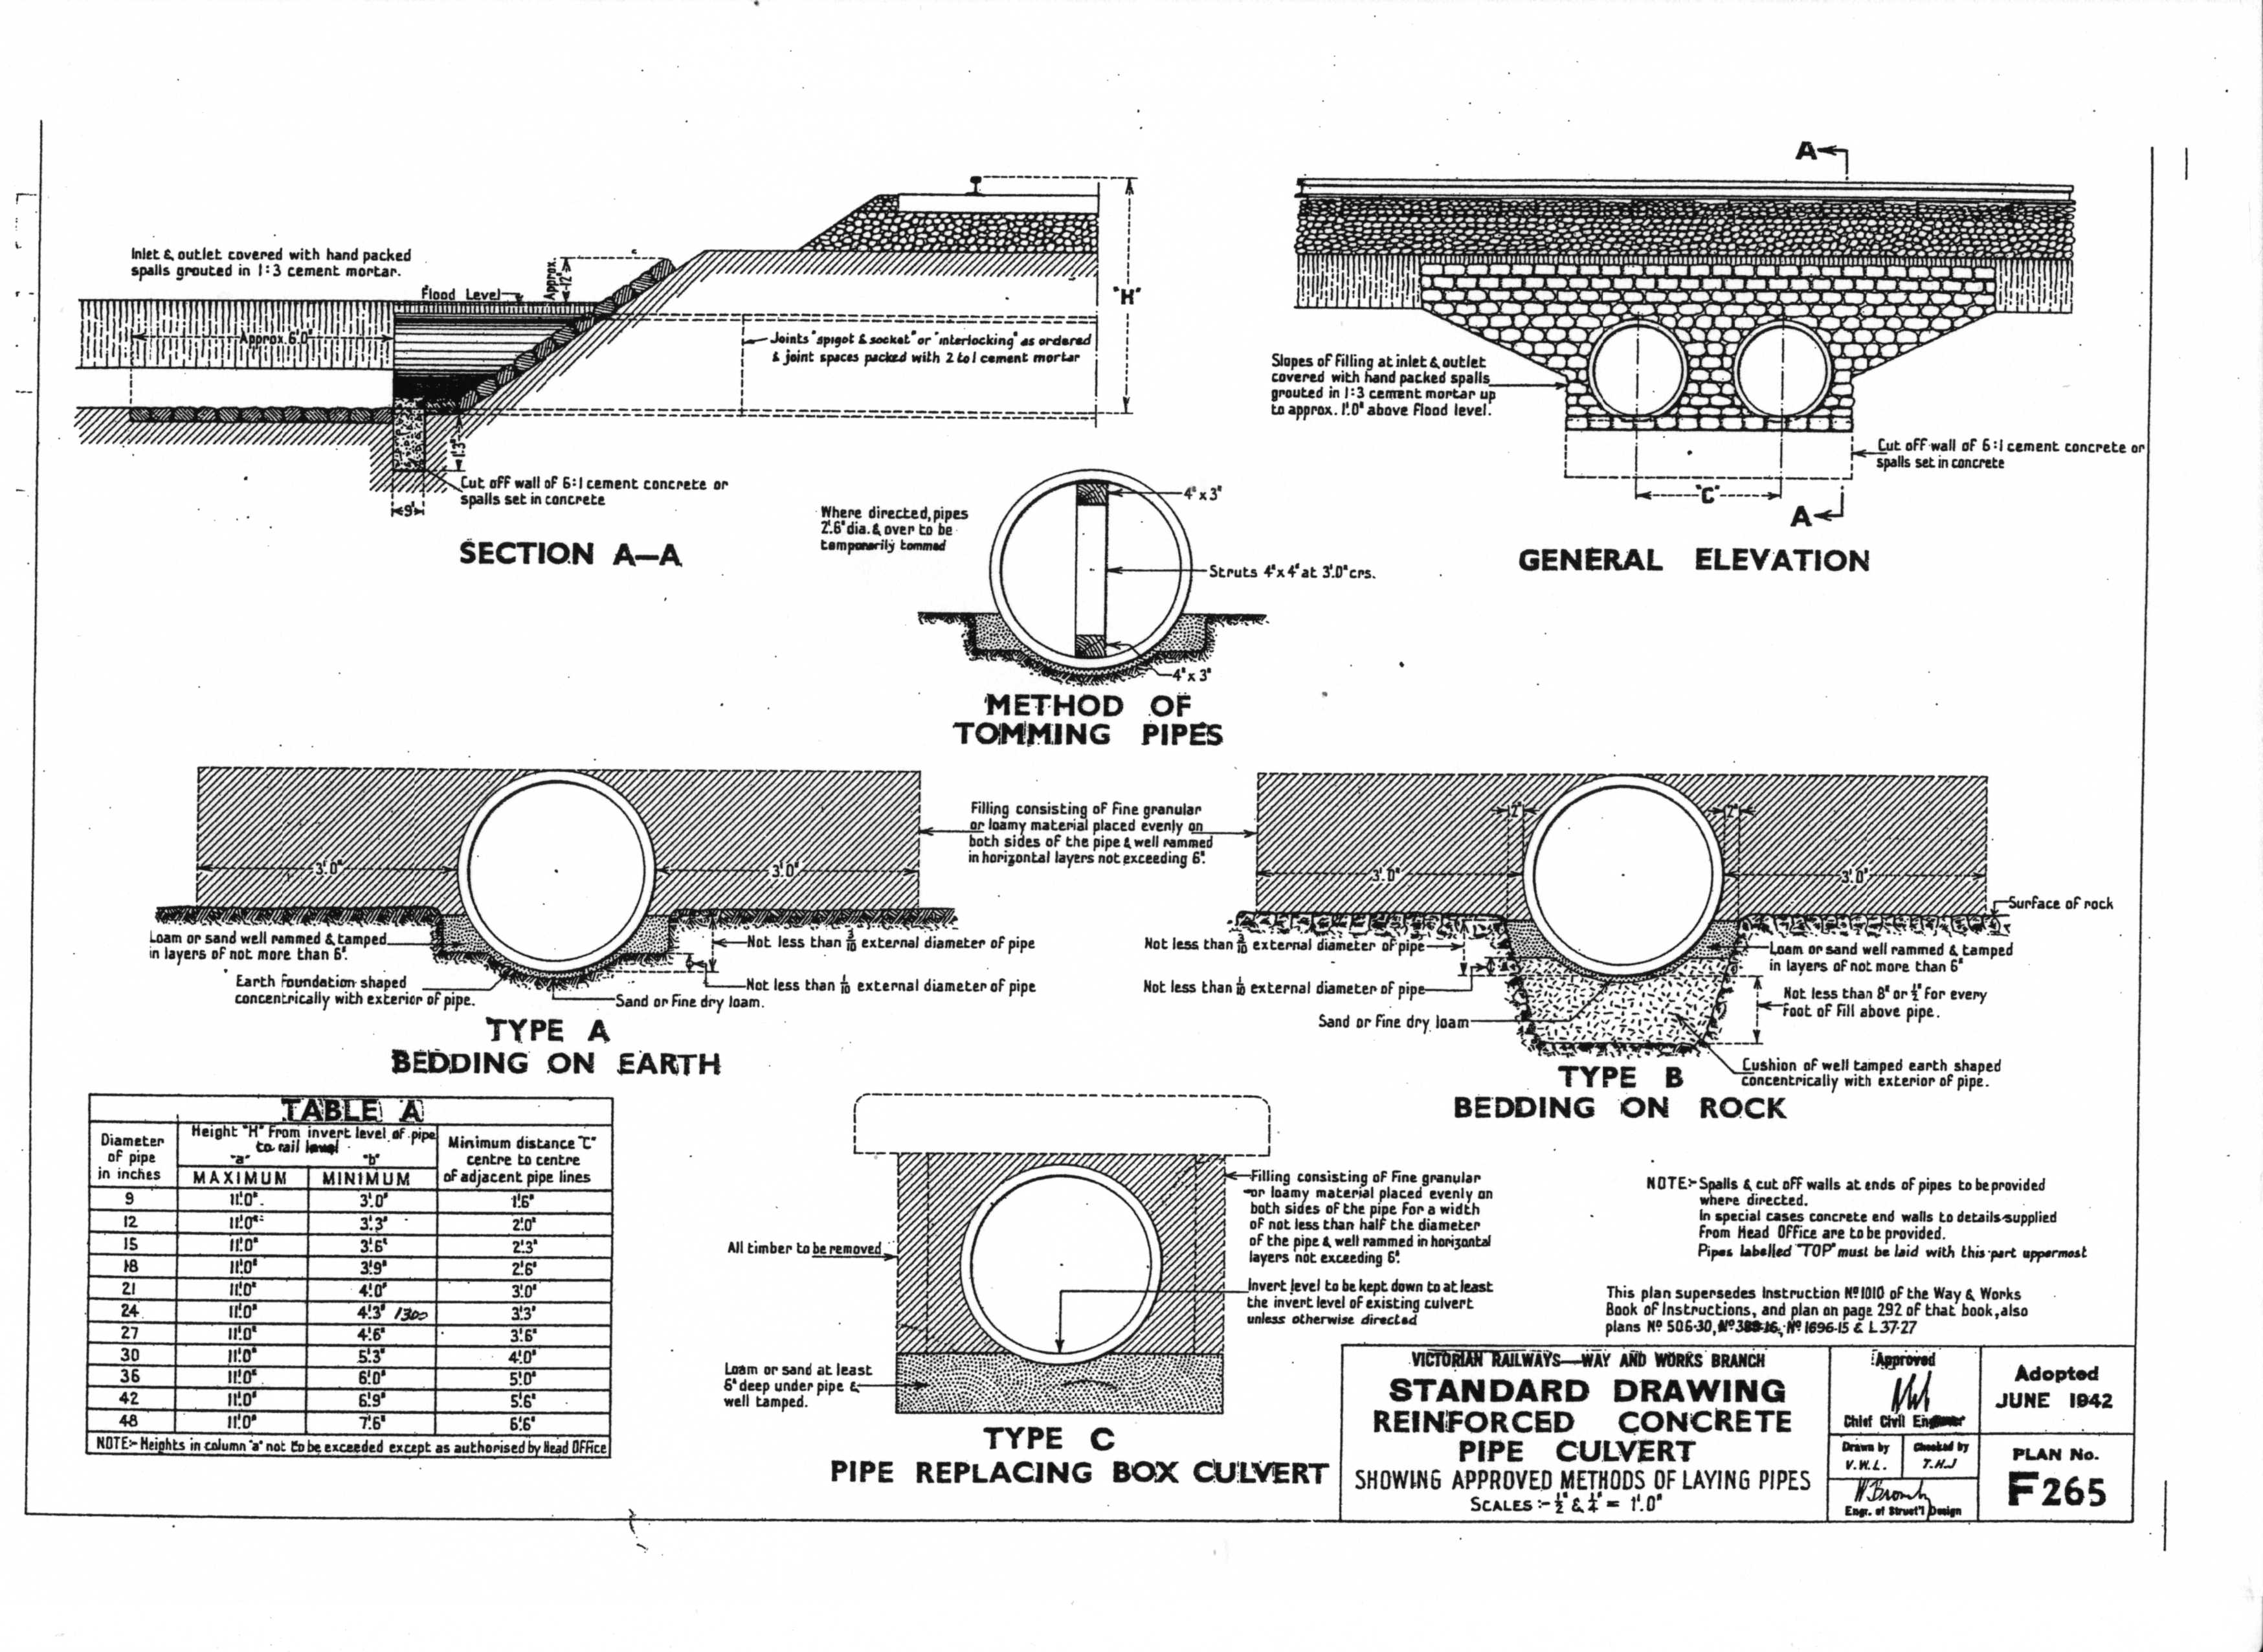 Simple Slab Culvert Design Drawings : culvert design - DriverLayer Search Engine